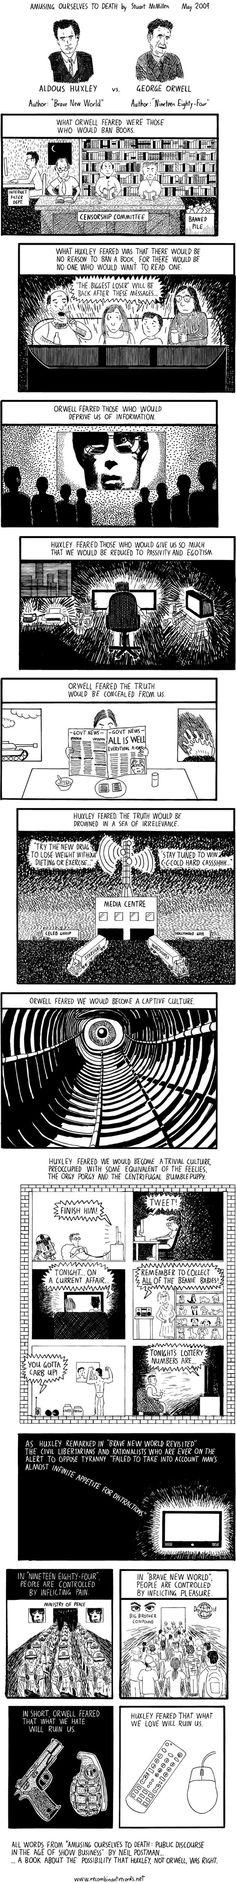 Orwell vs. Huxley: oppression creates resistance, while pleasure creates passivity